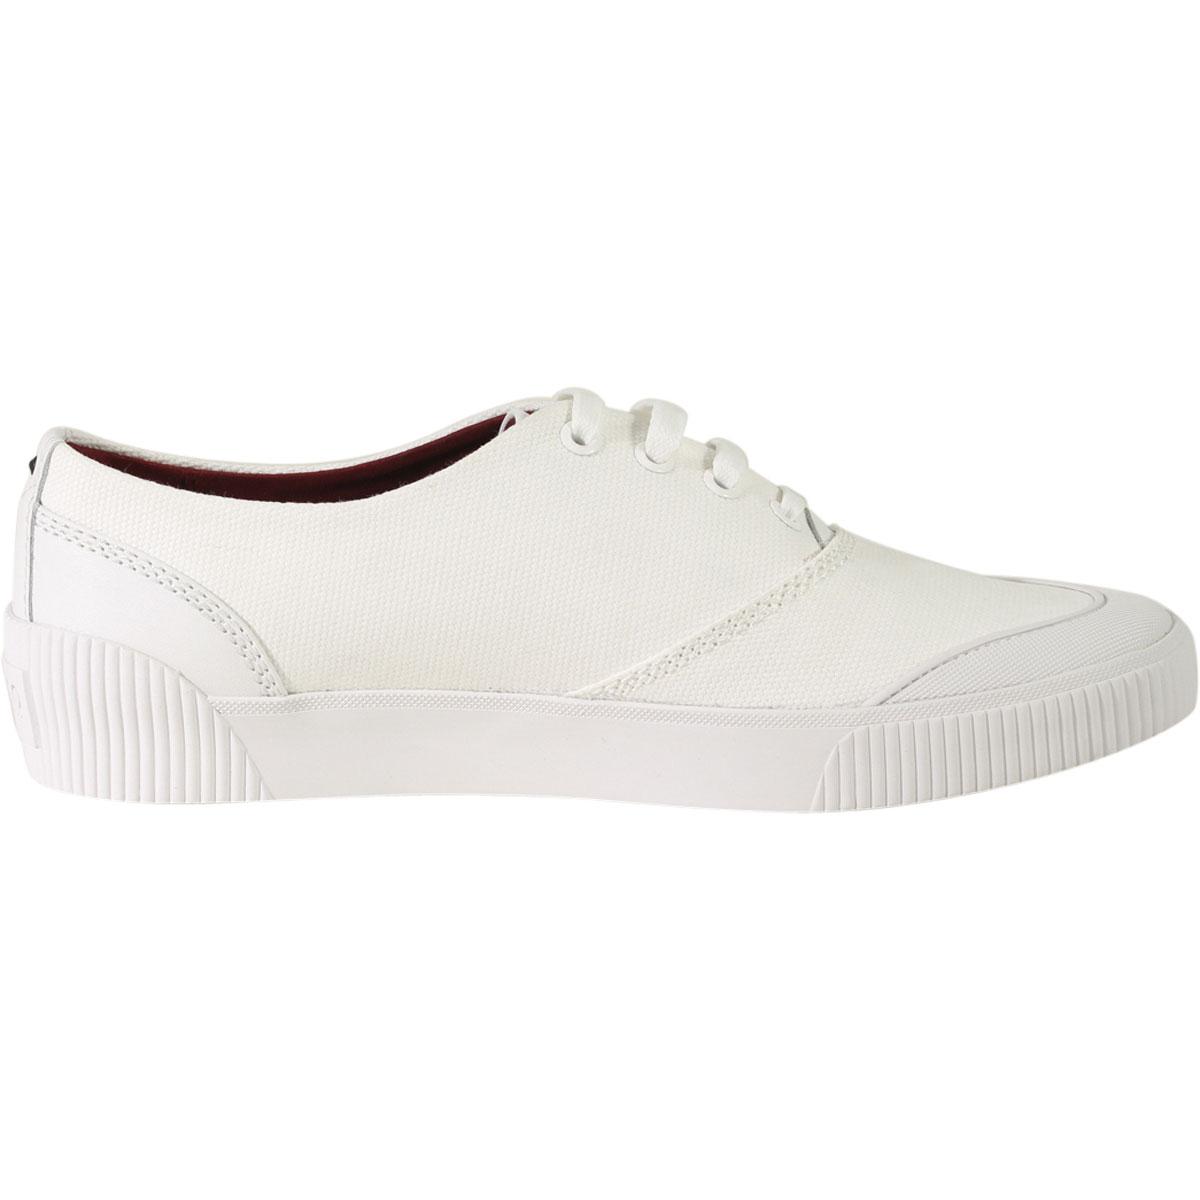 d13d4fcd85 Hugo Boss Men's Zero Tennis Sneakers Shoes | eBay